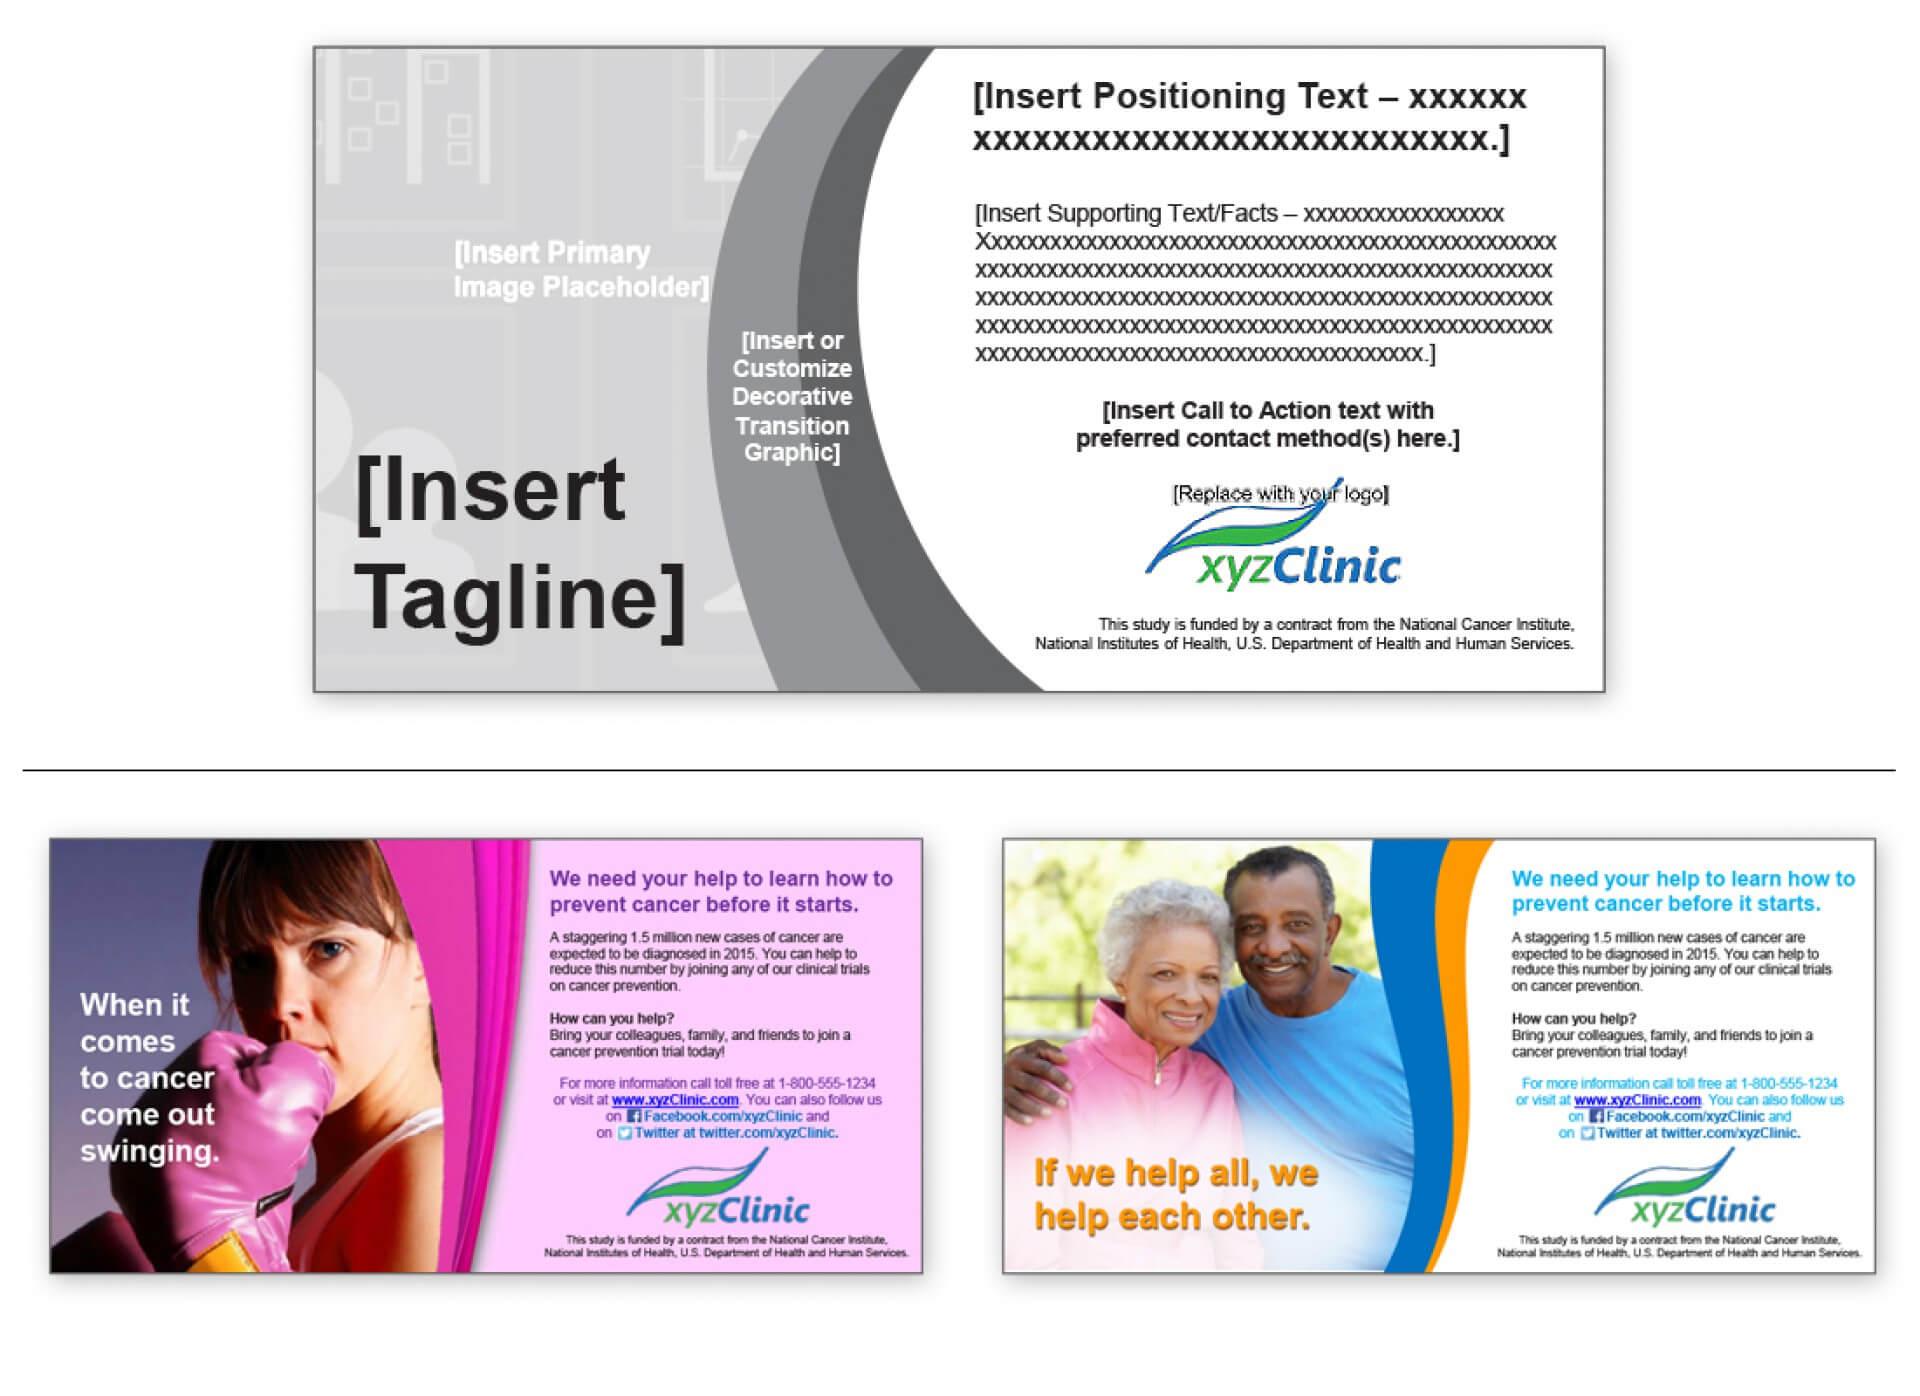 008 Half Page Template Ideas Quarter Sheet Flyer Word Ityot In Quarter Sheet Flyer Template Word